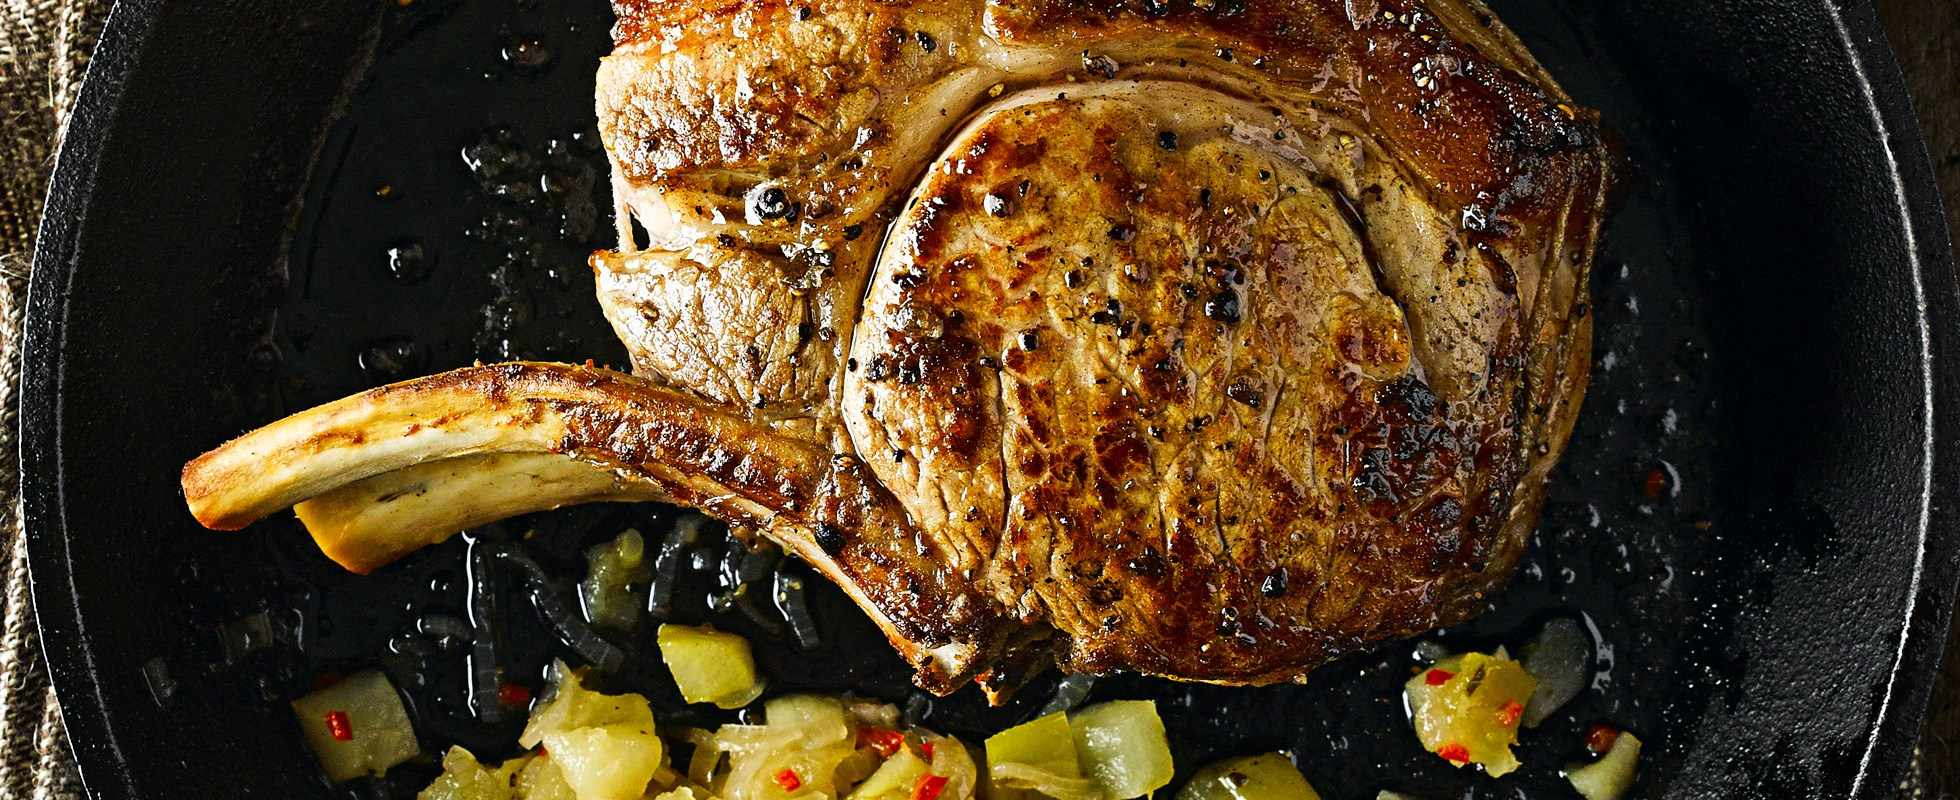 Cider Pork Chop Recipe